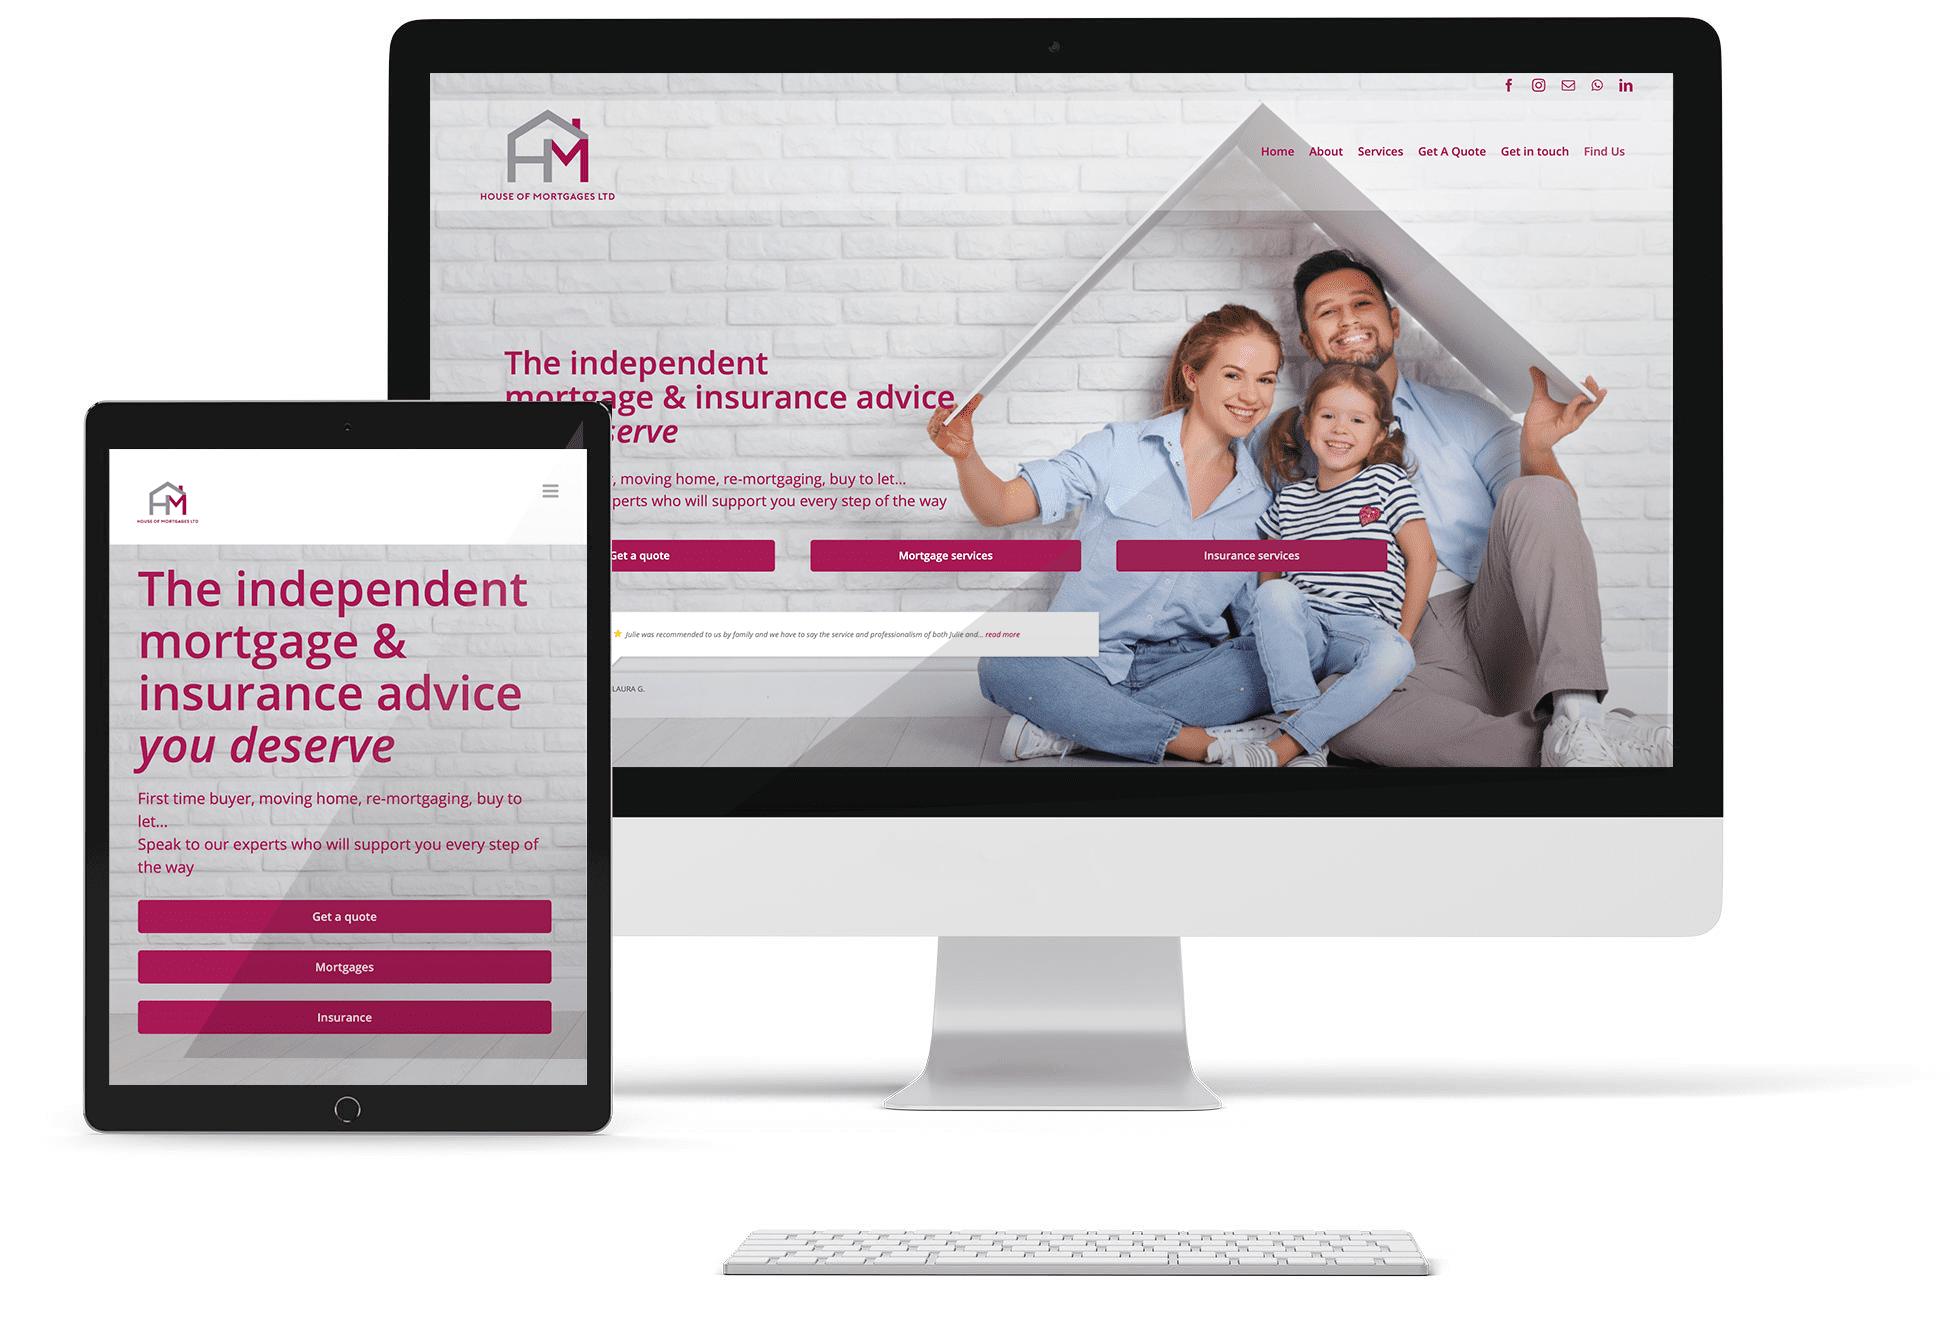 Springtide Digital Marketing - Web Design and CRM